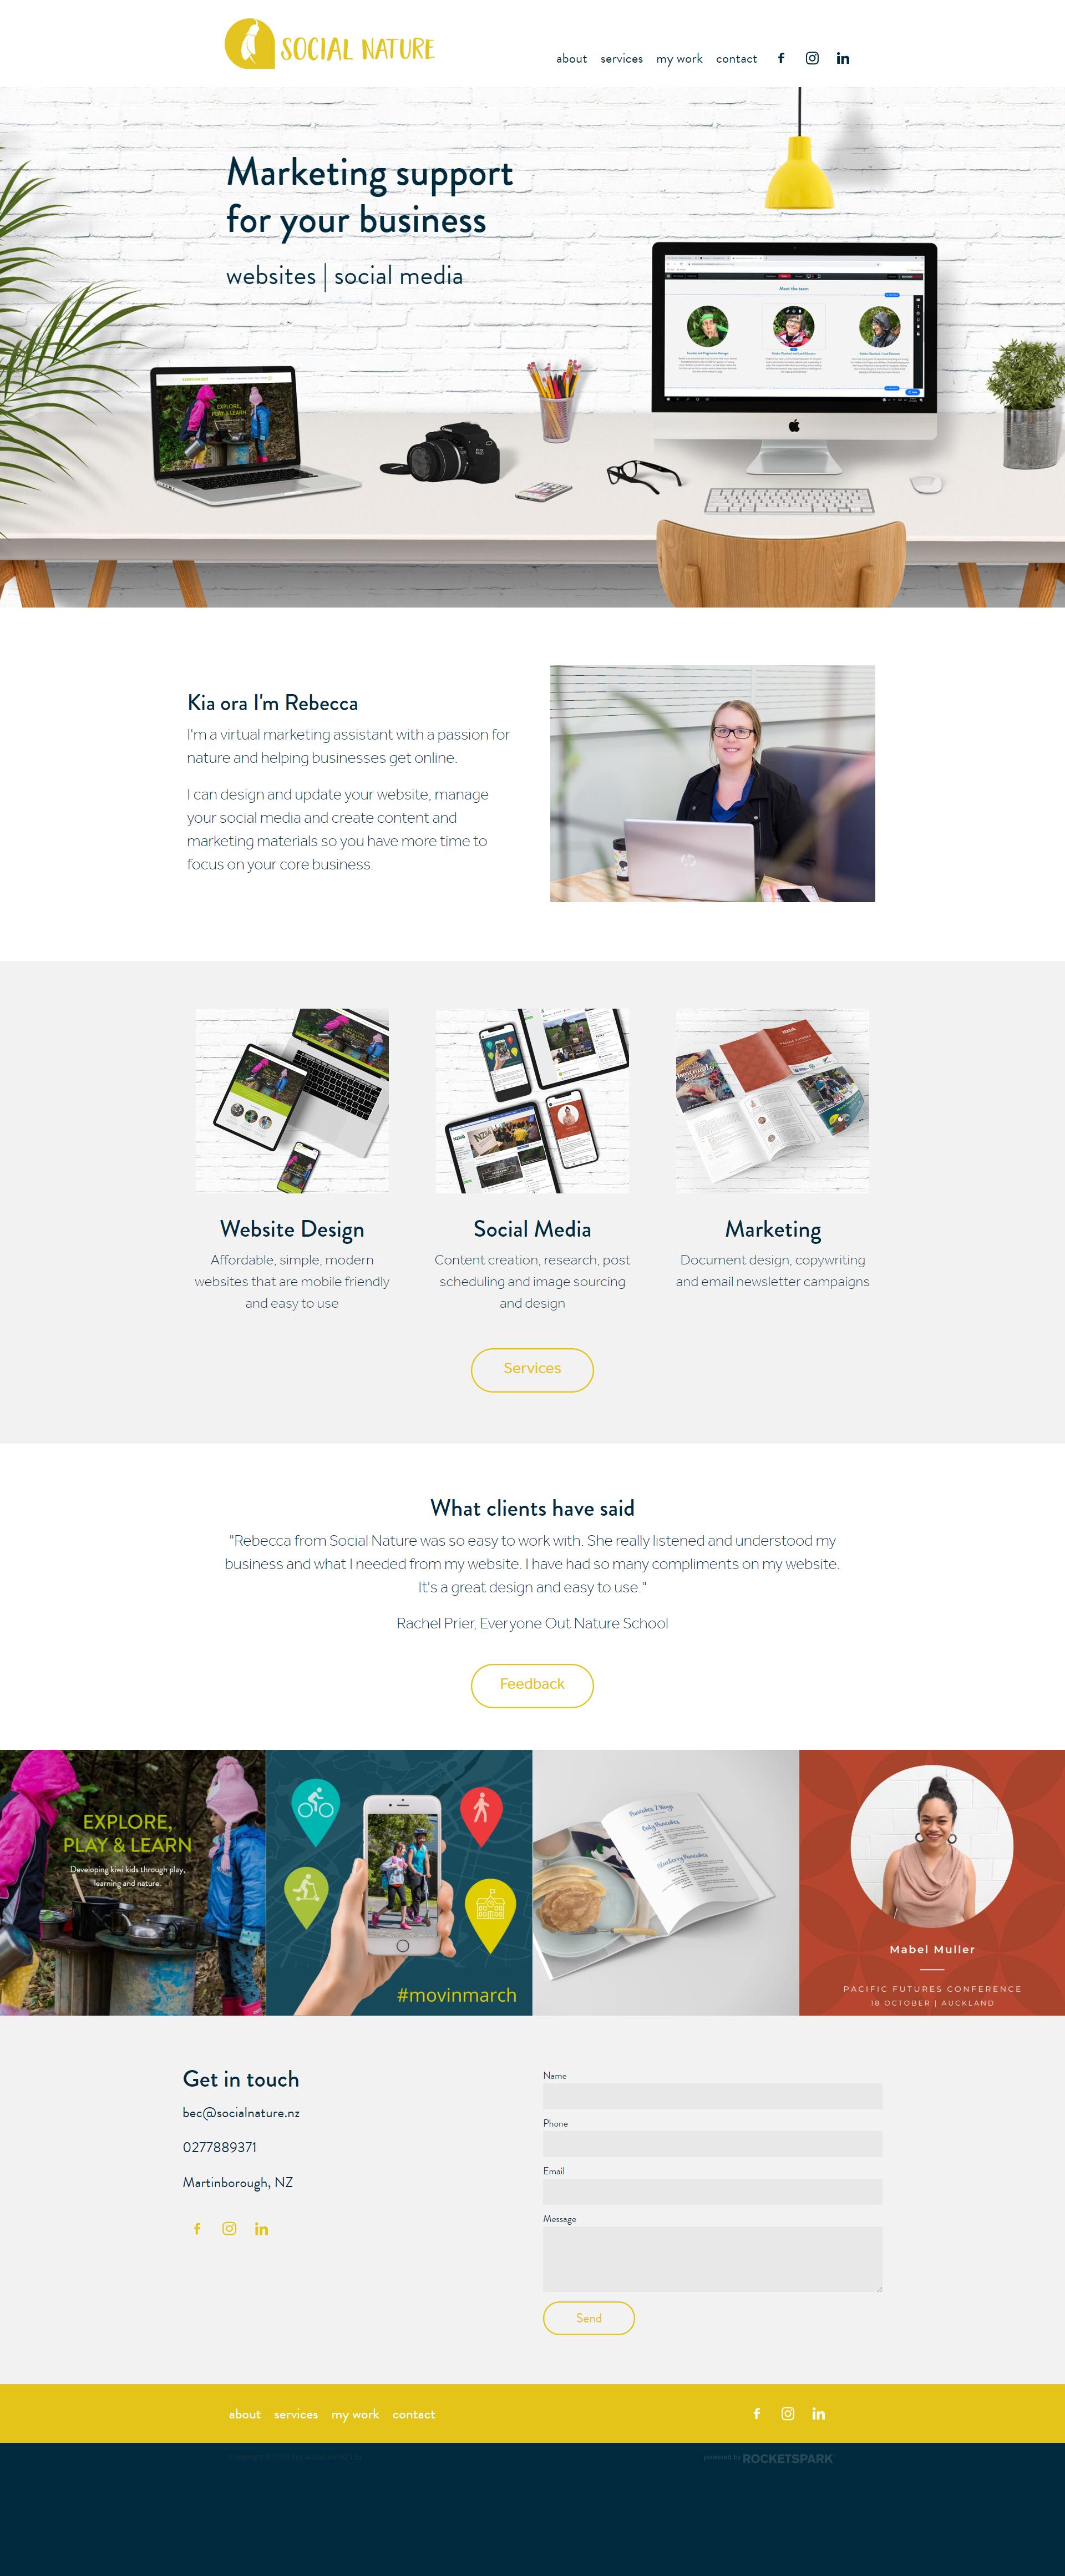 Wairarapa Website Design In 2020 Website Design Social Media Services Marketing Support